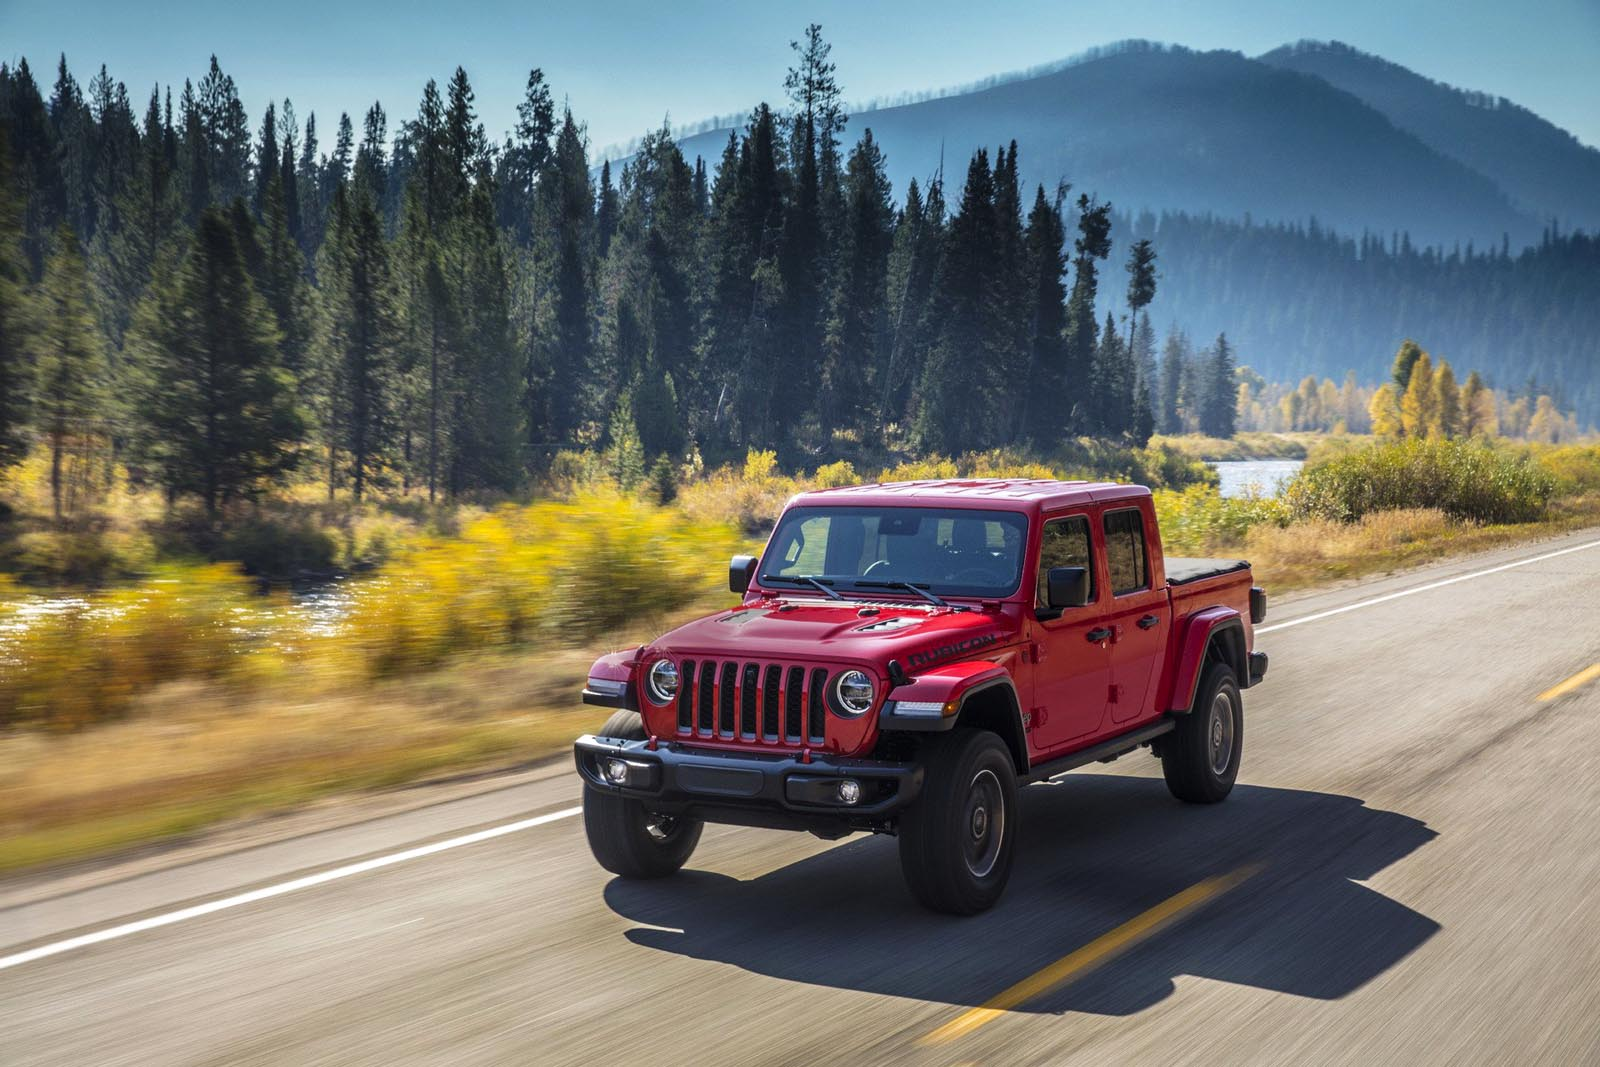 Photo of Βάλτε ένα Jeep αν θέλετε να έχετε επιτυχία στο διαδικτυακό φλερτ